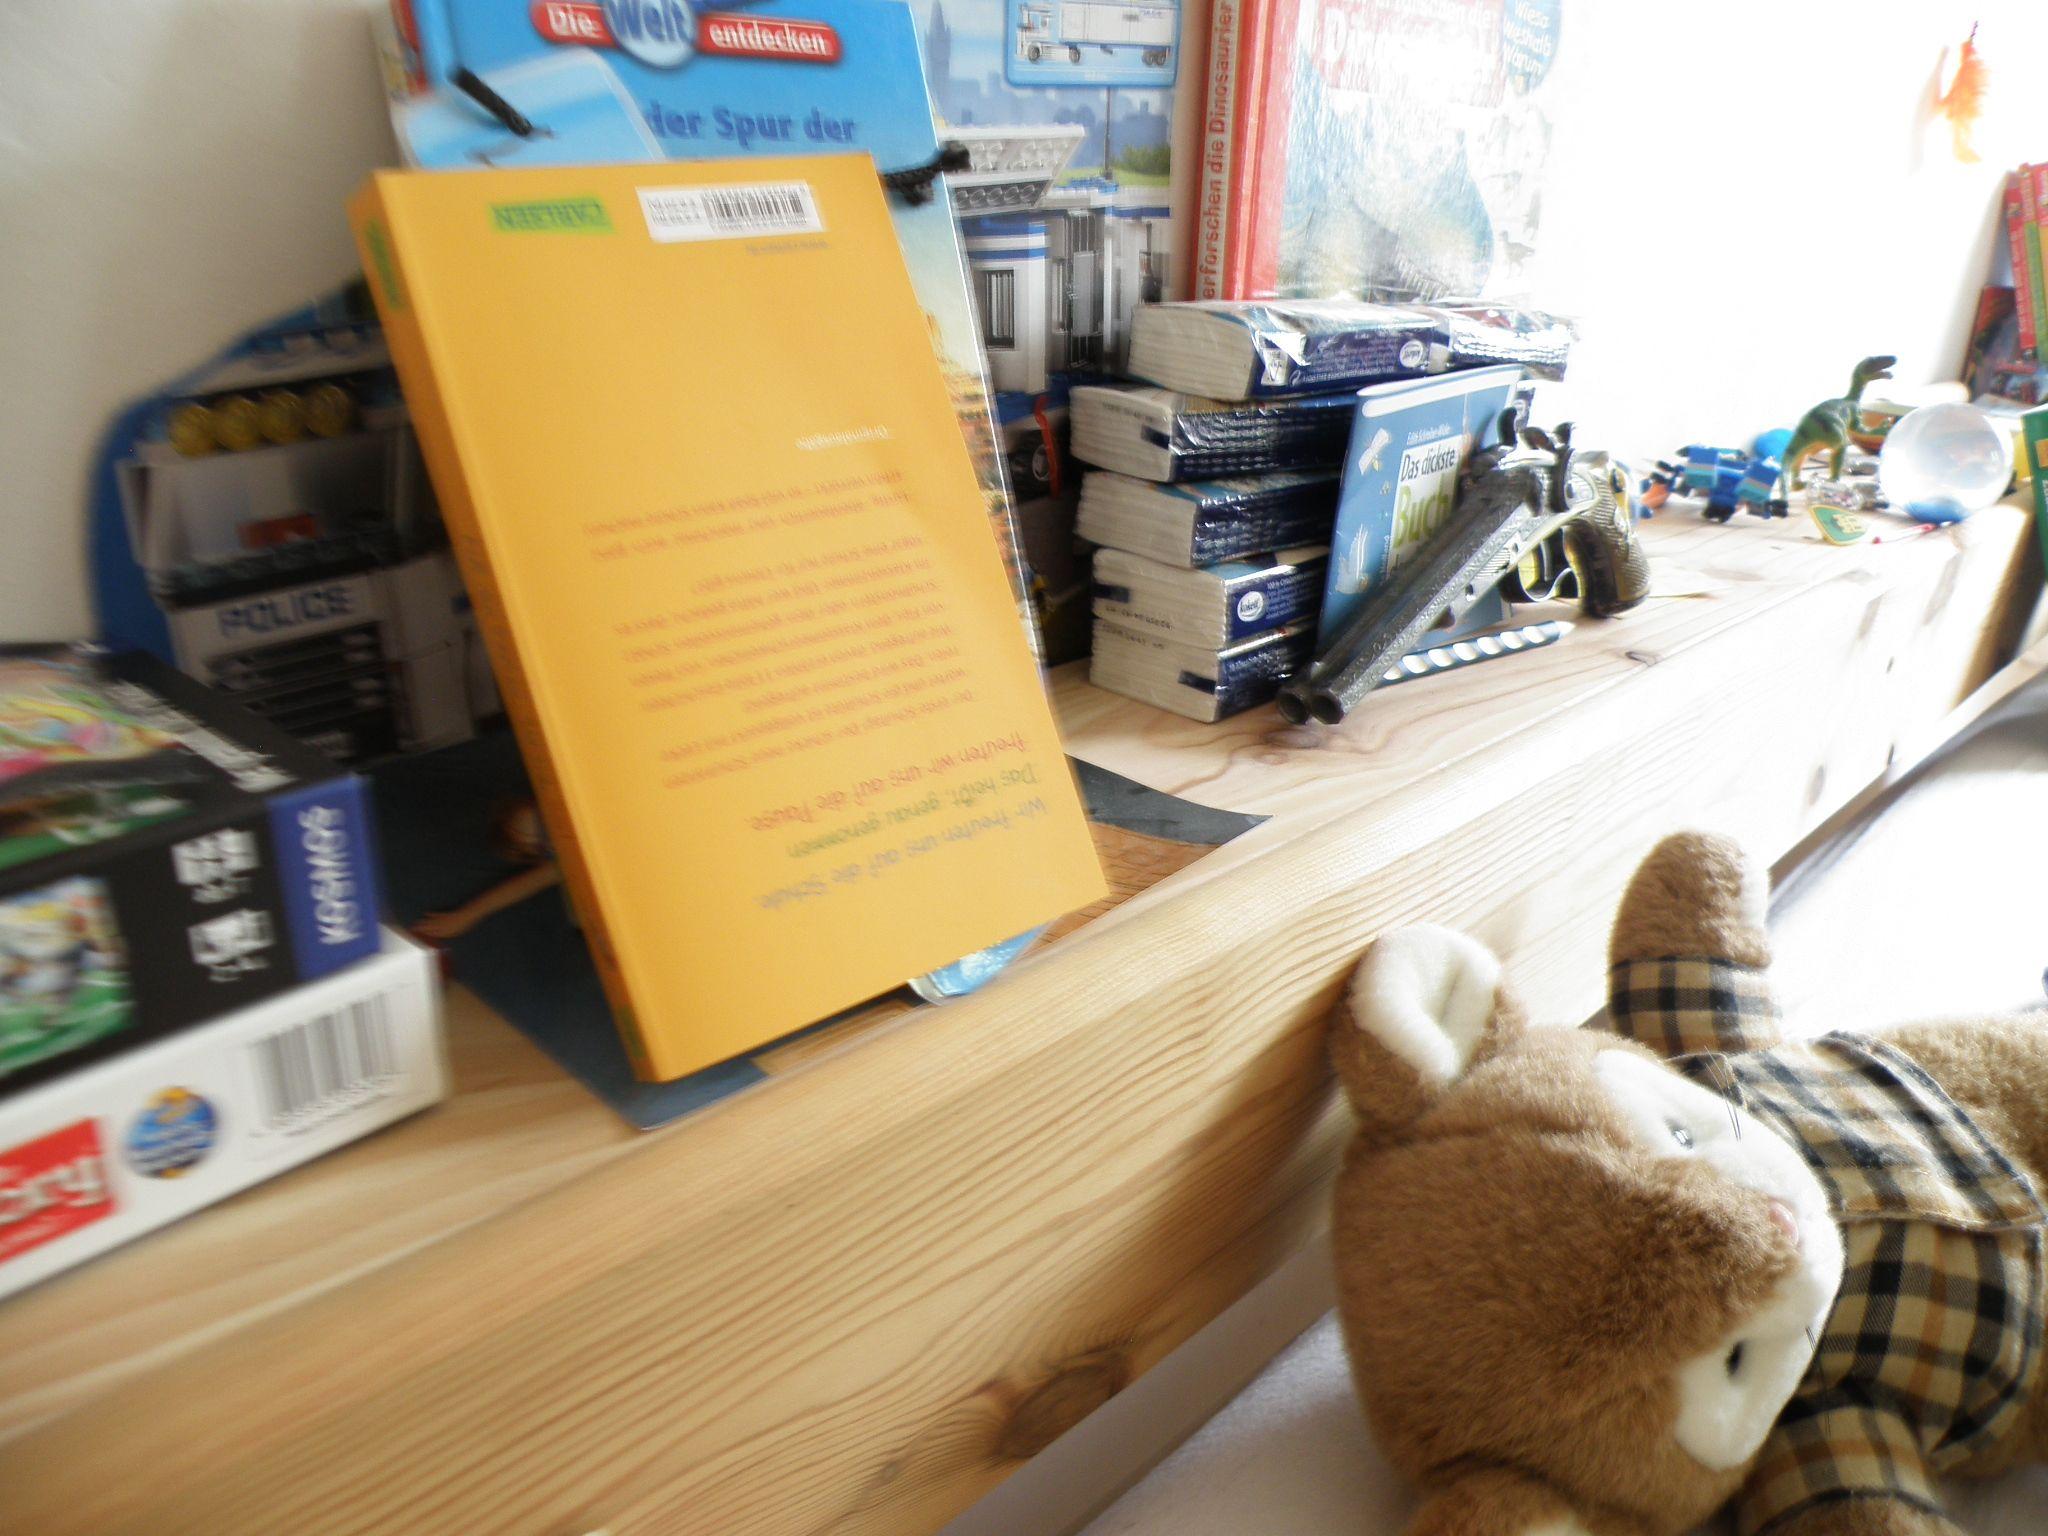 Reduzieren im Kinderzimmer | MamaDenkt.de